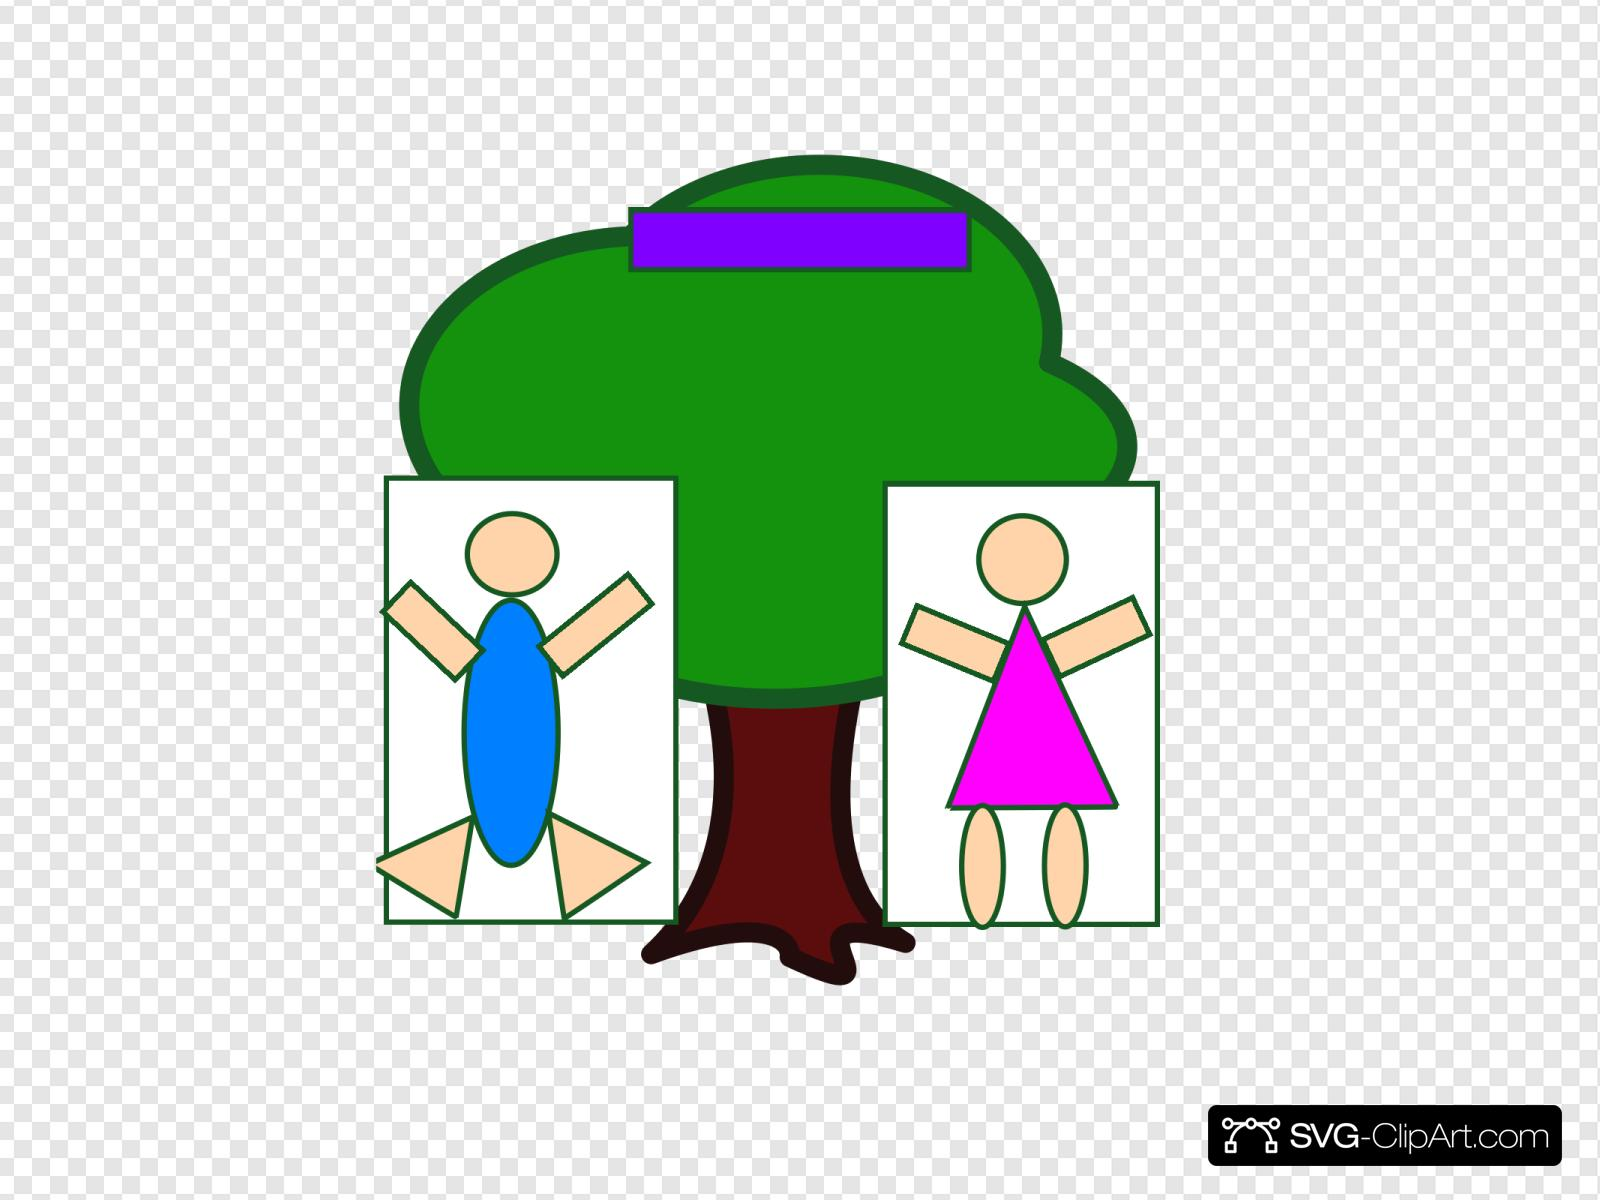 Family Tree Svg Vector Family Tree Clip Art Svg Clipart